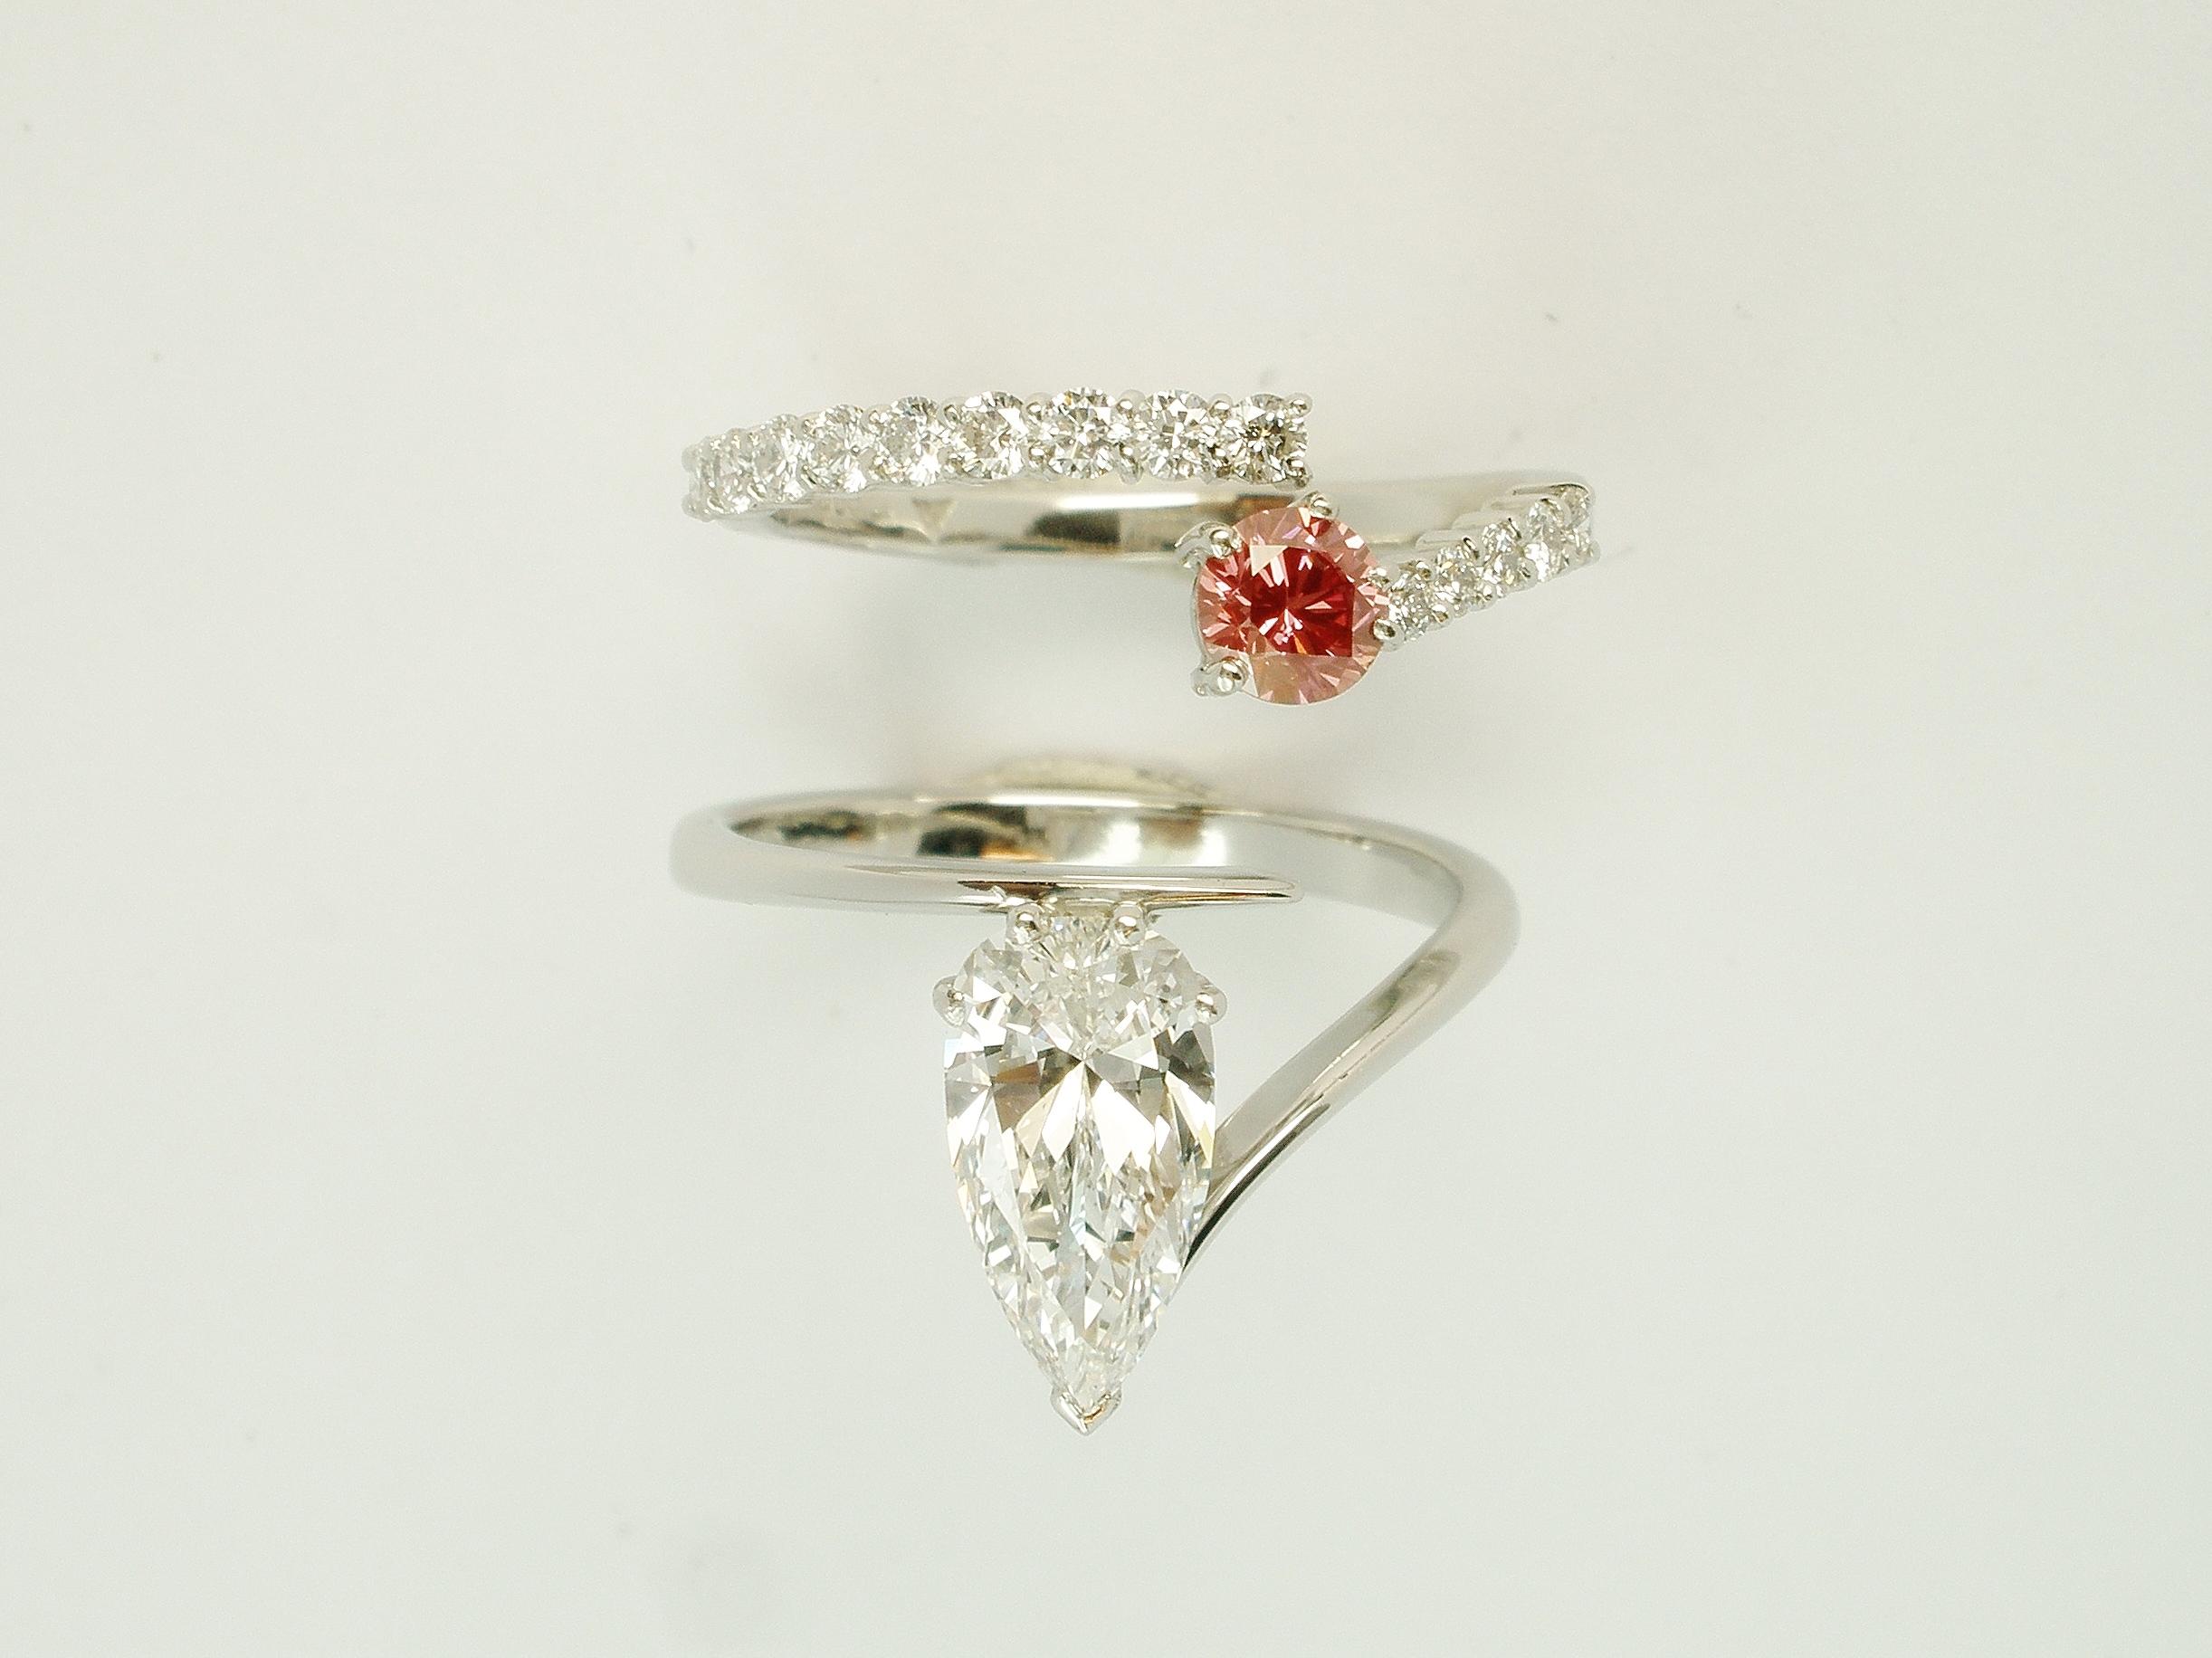 Pink round brilliant cut diamond & white diamond wire set platinum wedding ring shaped to interlock with a single diamond pear wishbone cross-over engagement ring.